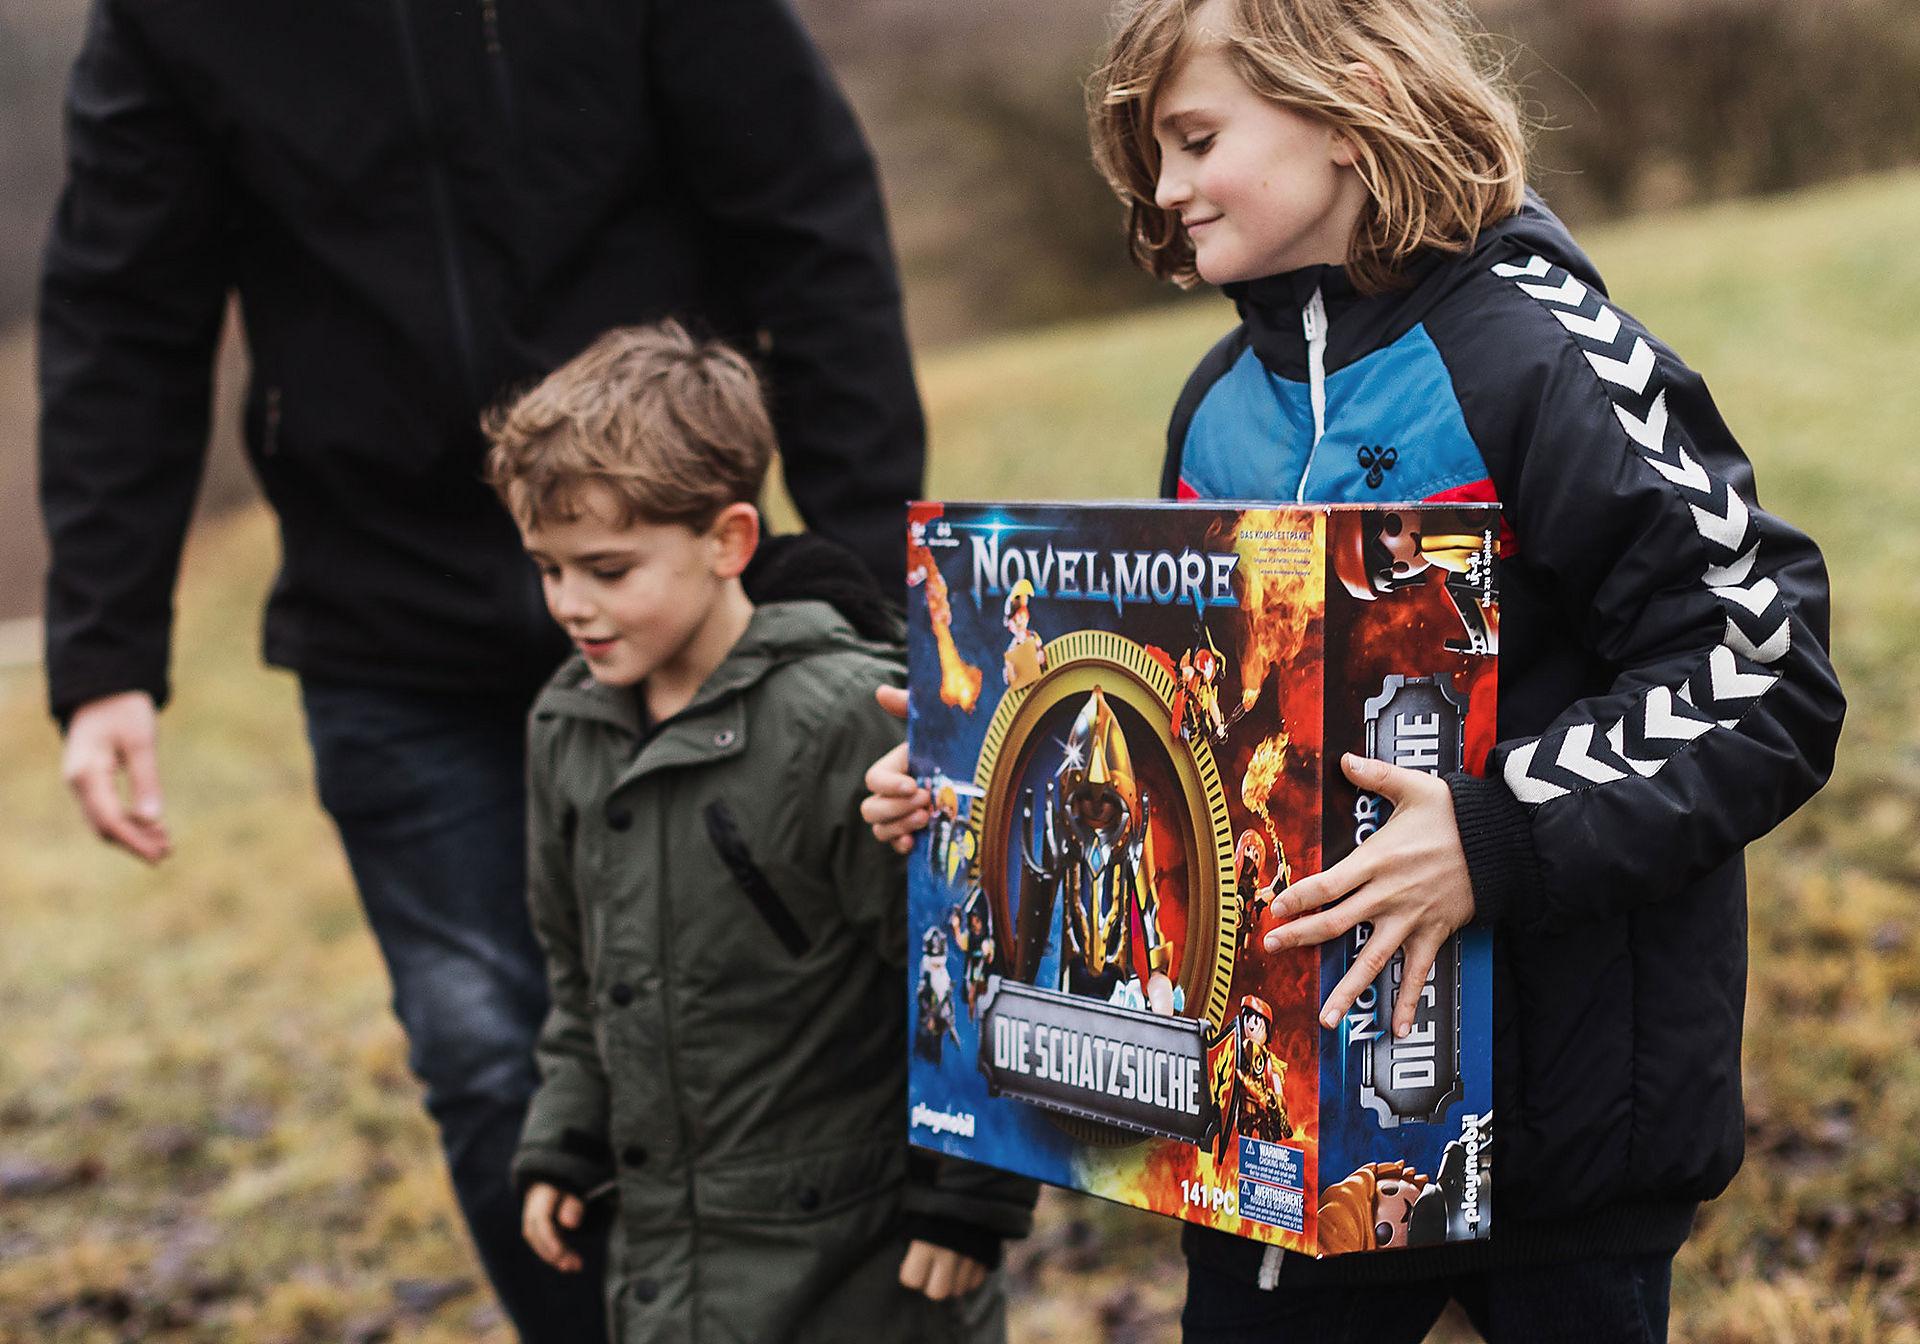 70736 PLAYMOBIL®Box: NOVELMORE Die Schatzsuche Das Familienevent zoom image9